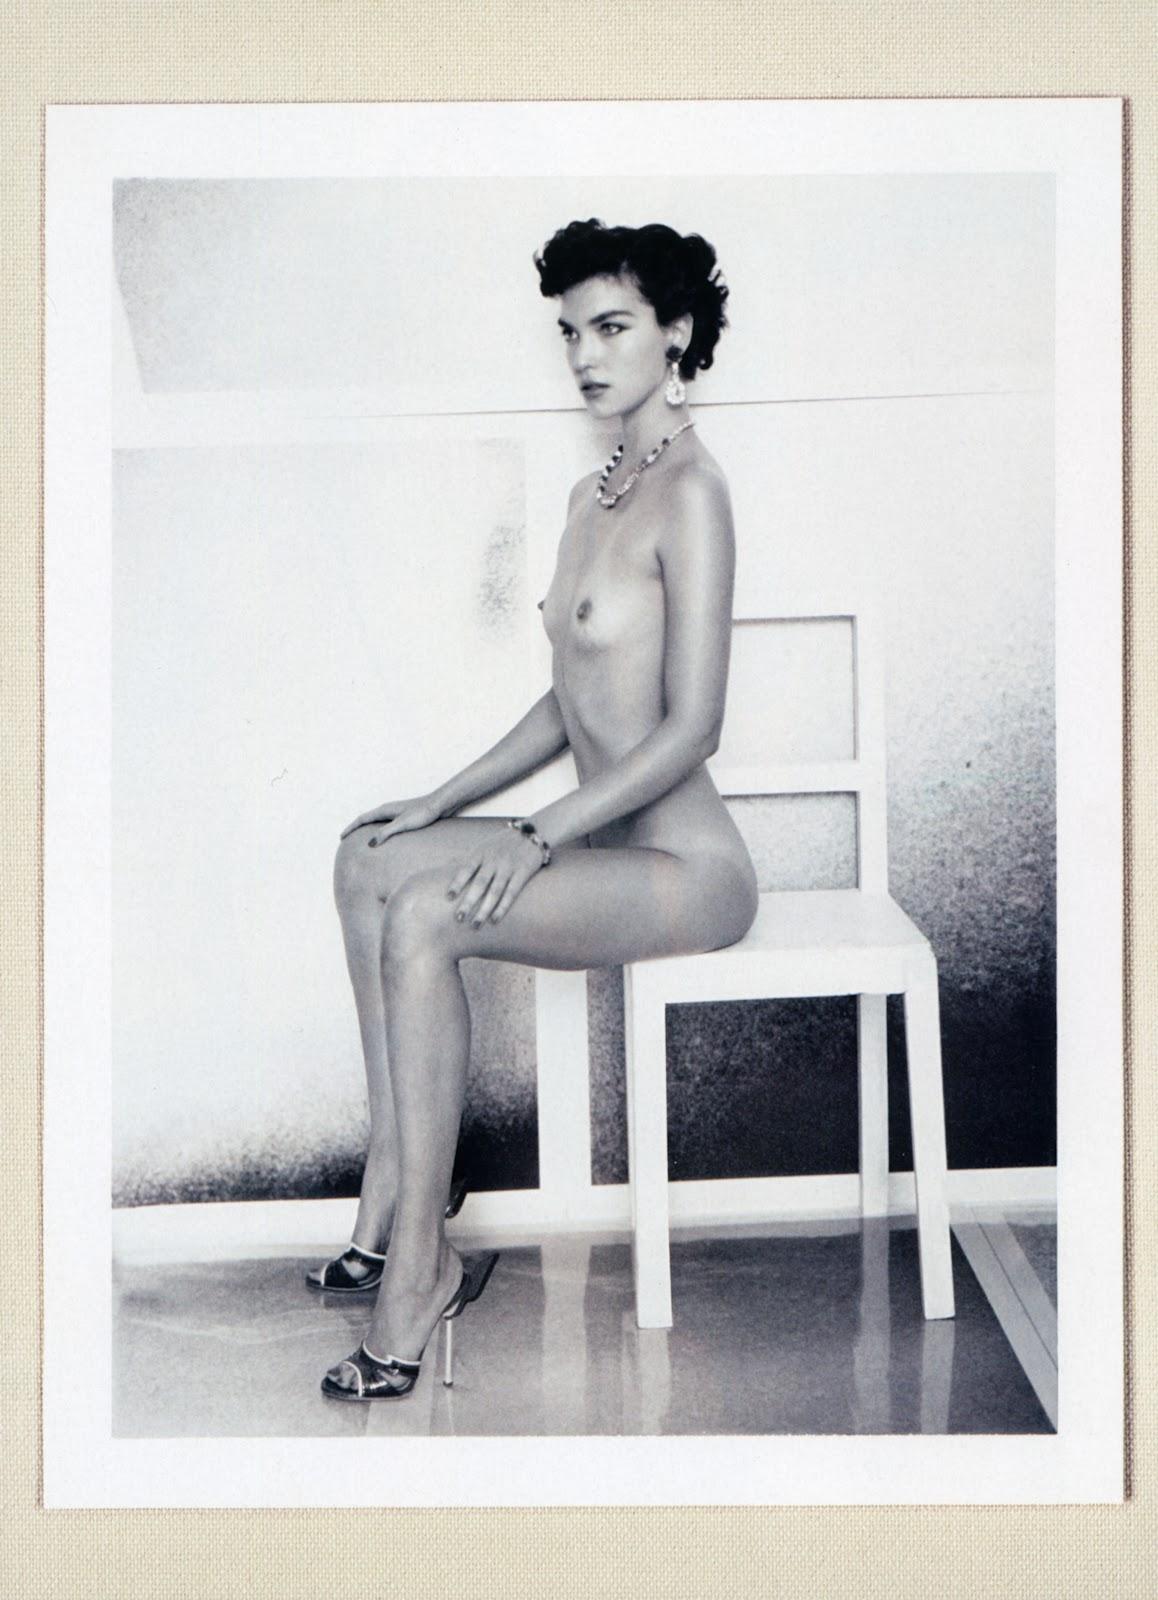 http://1.bp.blogspot.com/-aM6hnUNLe88/T3oo7taT7dI/AAAAAAAAlu0/EwoRpHI5yek/s1600/Arizona+Muse+by+Paolo+Roversi+for+Vogue+Italia+arizona-italia-1.jpeg